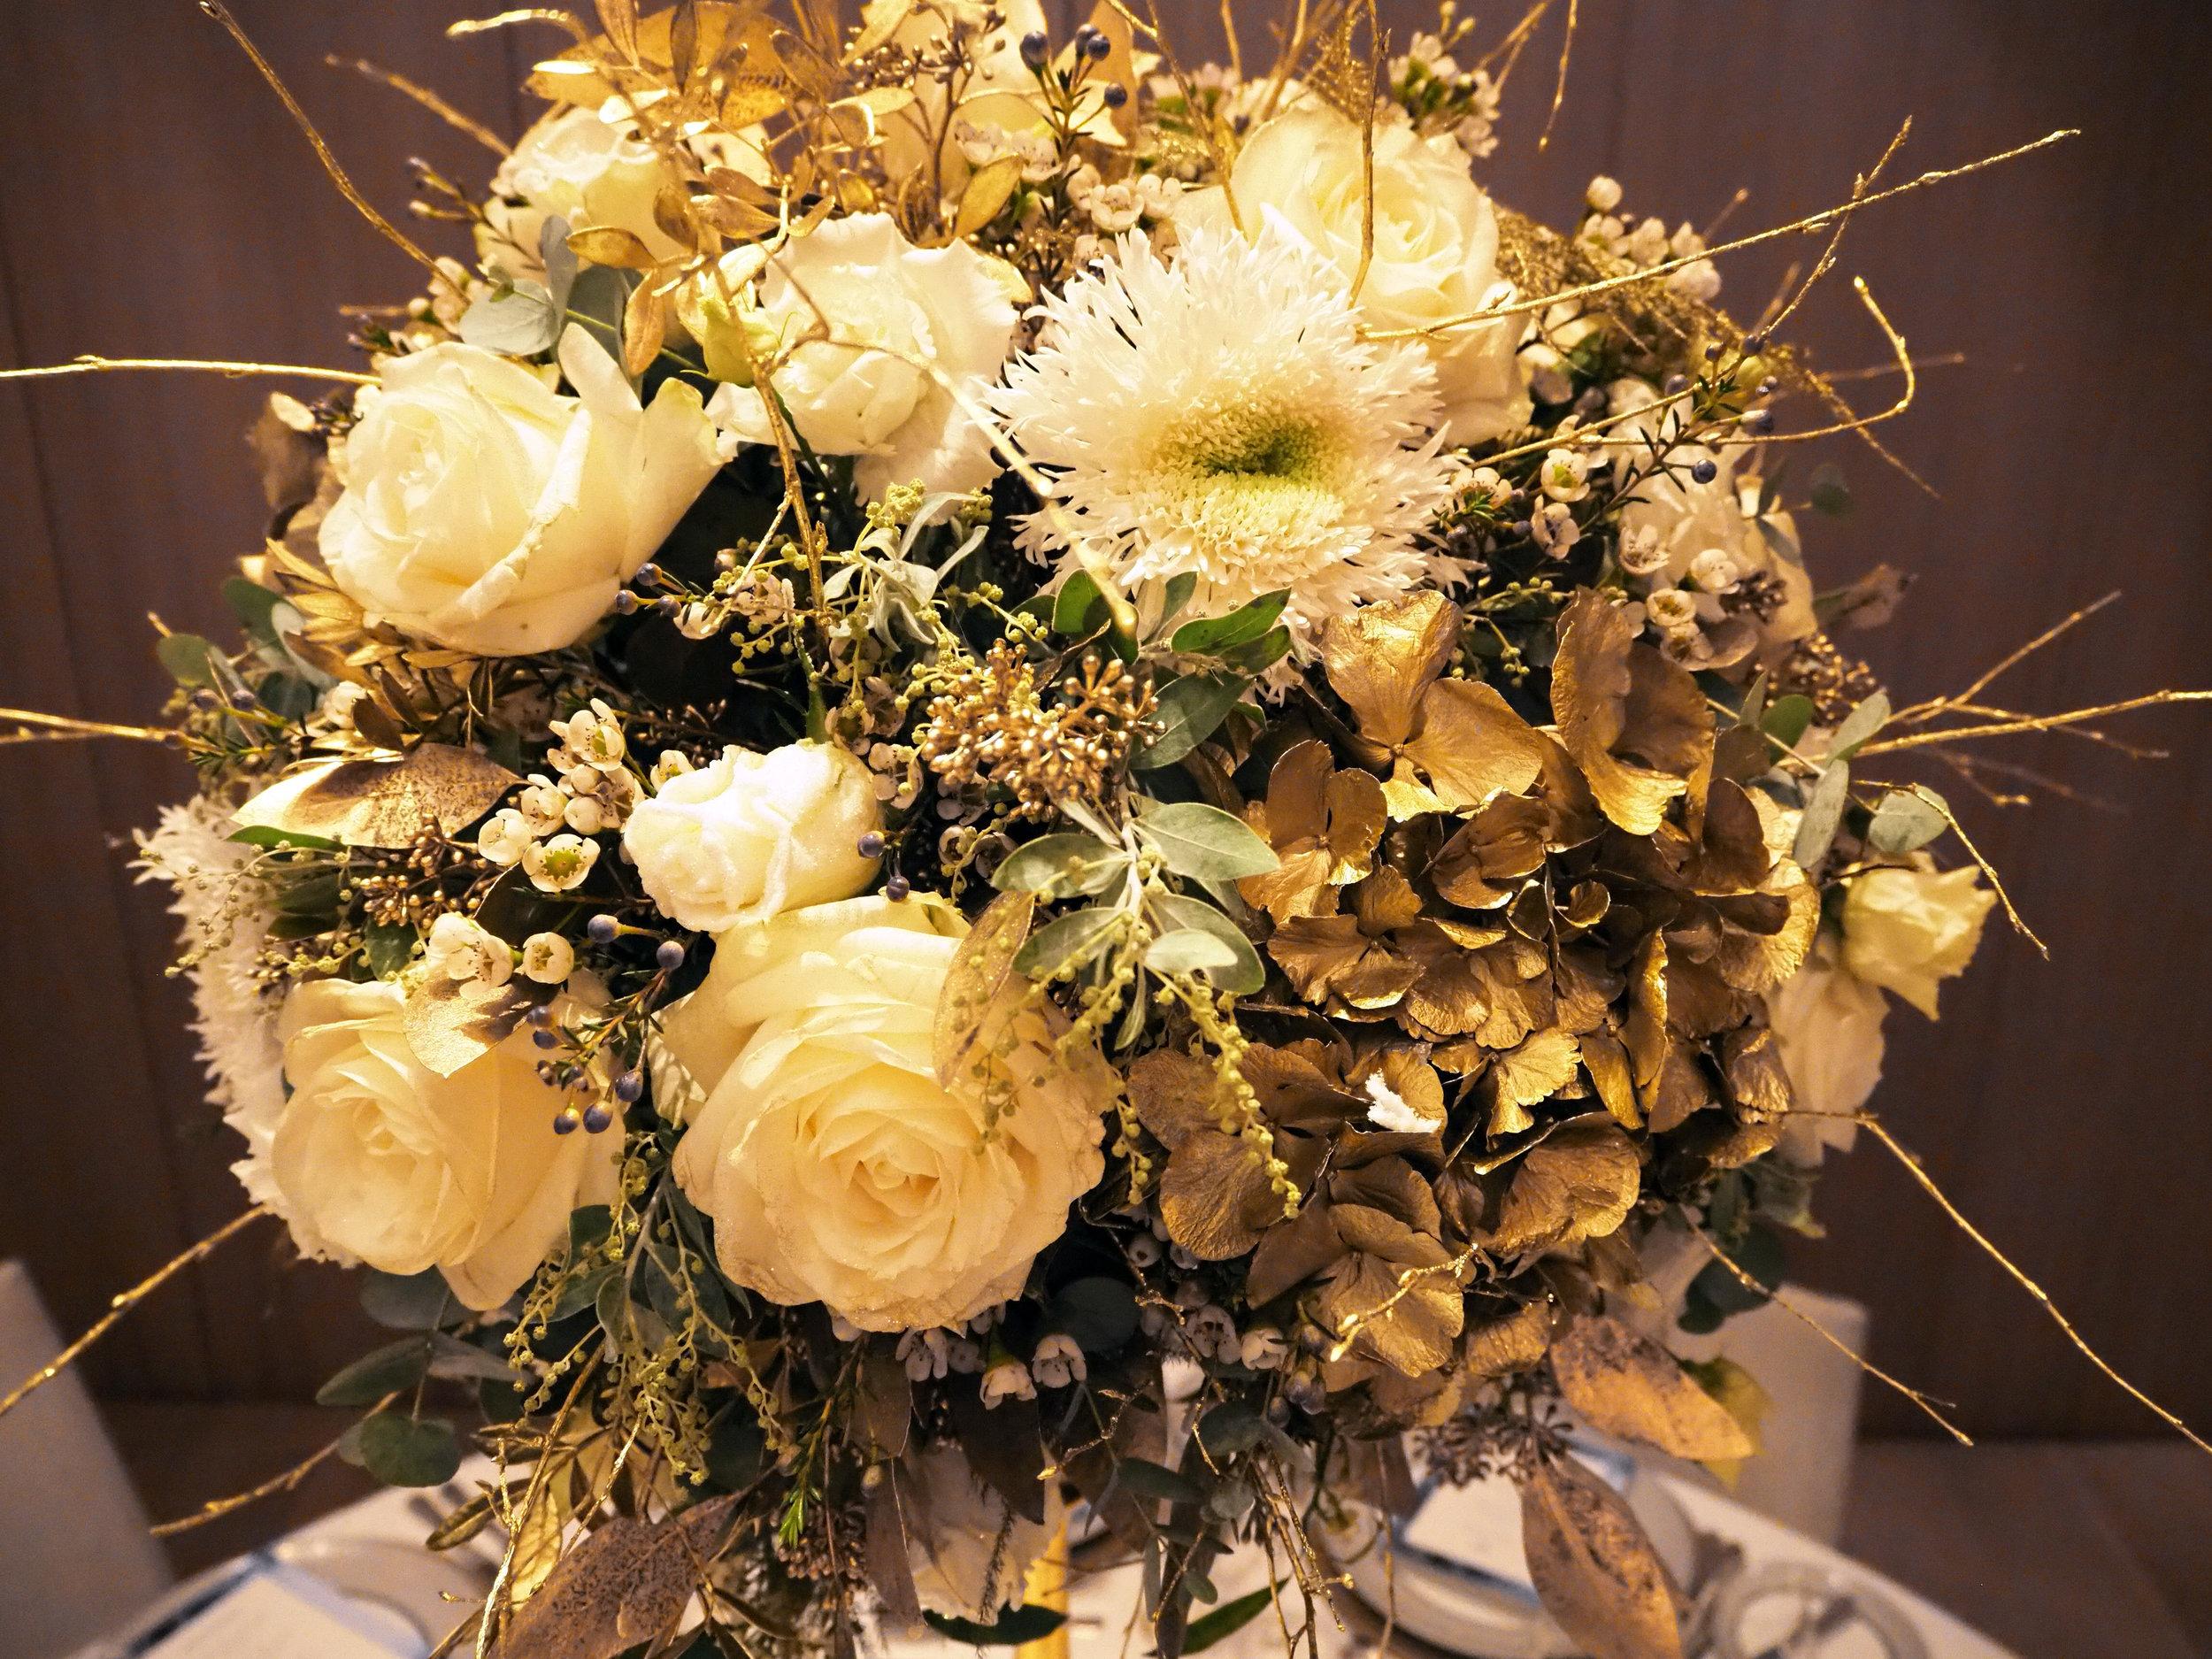 Gold Floral Centrepiece